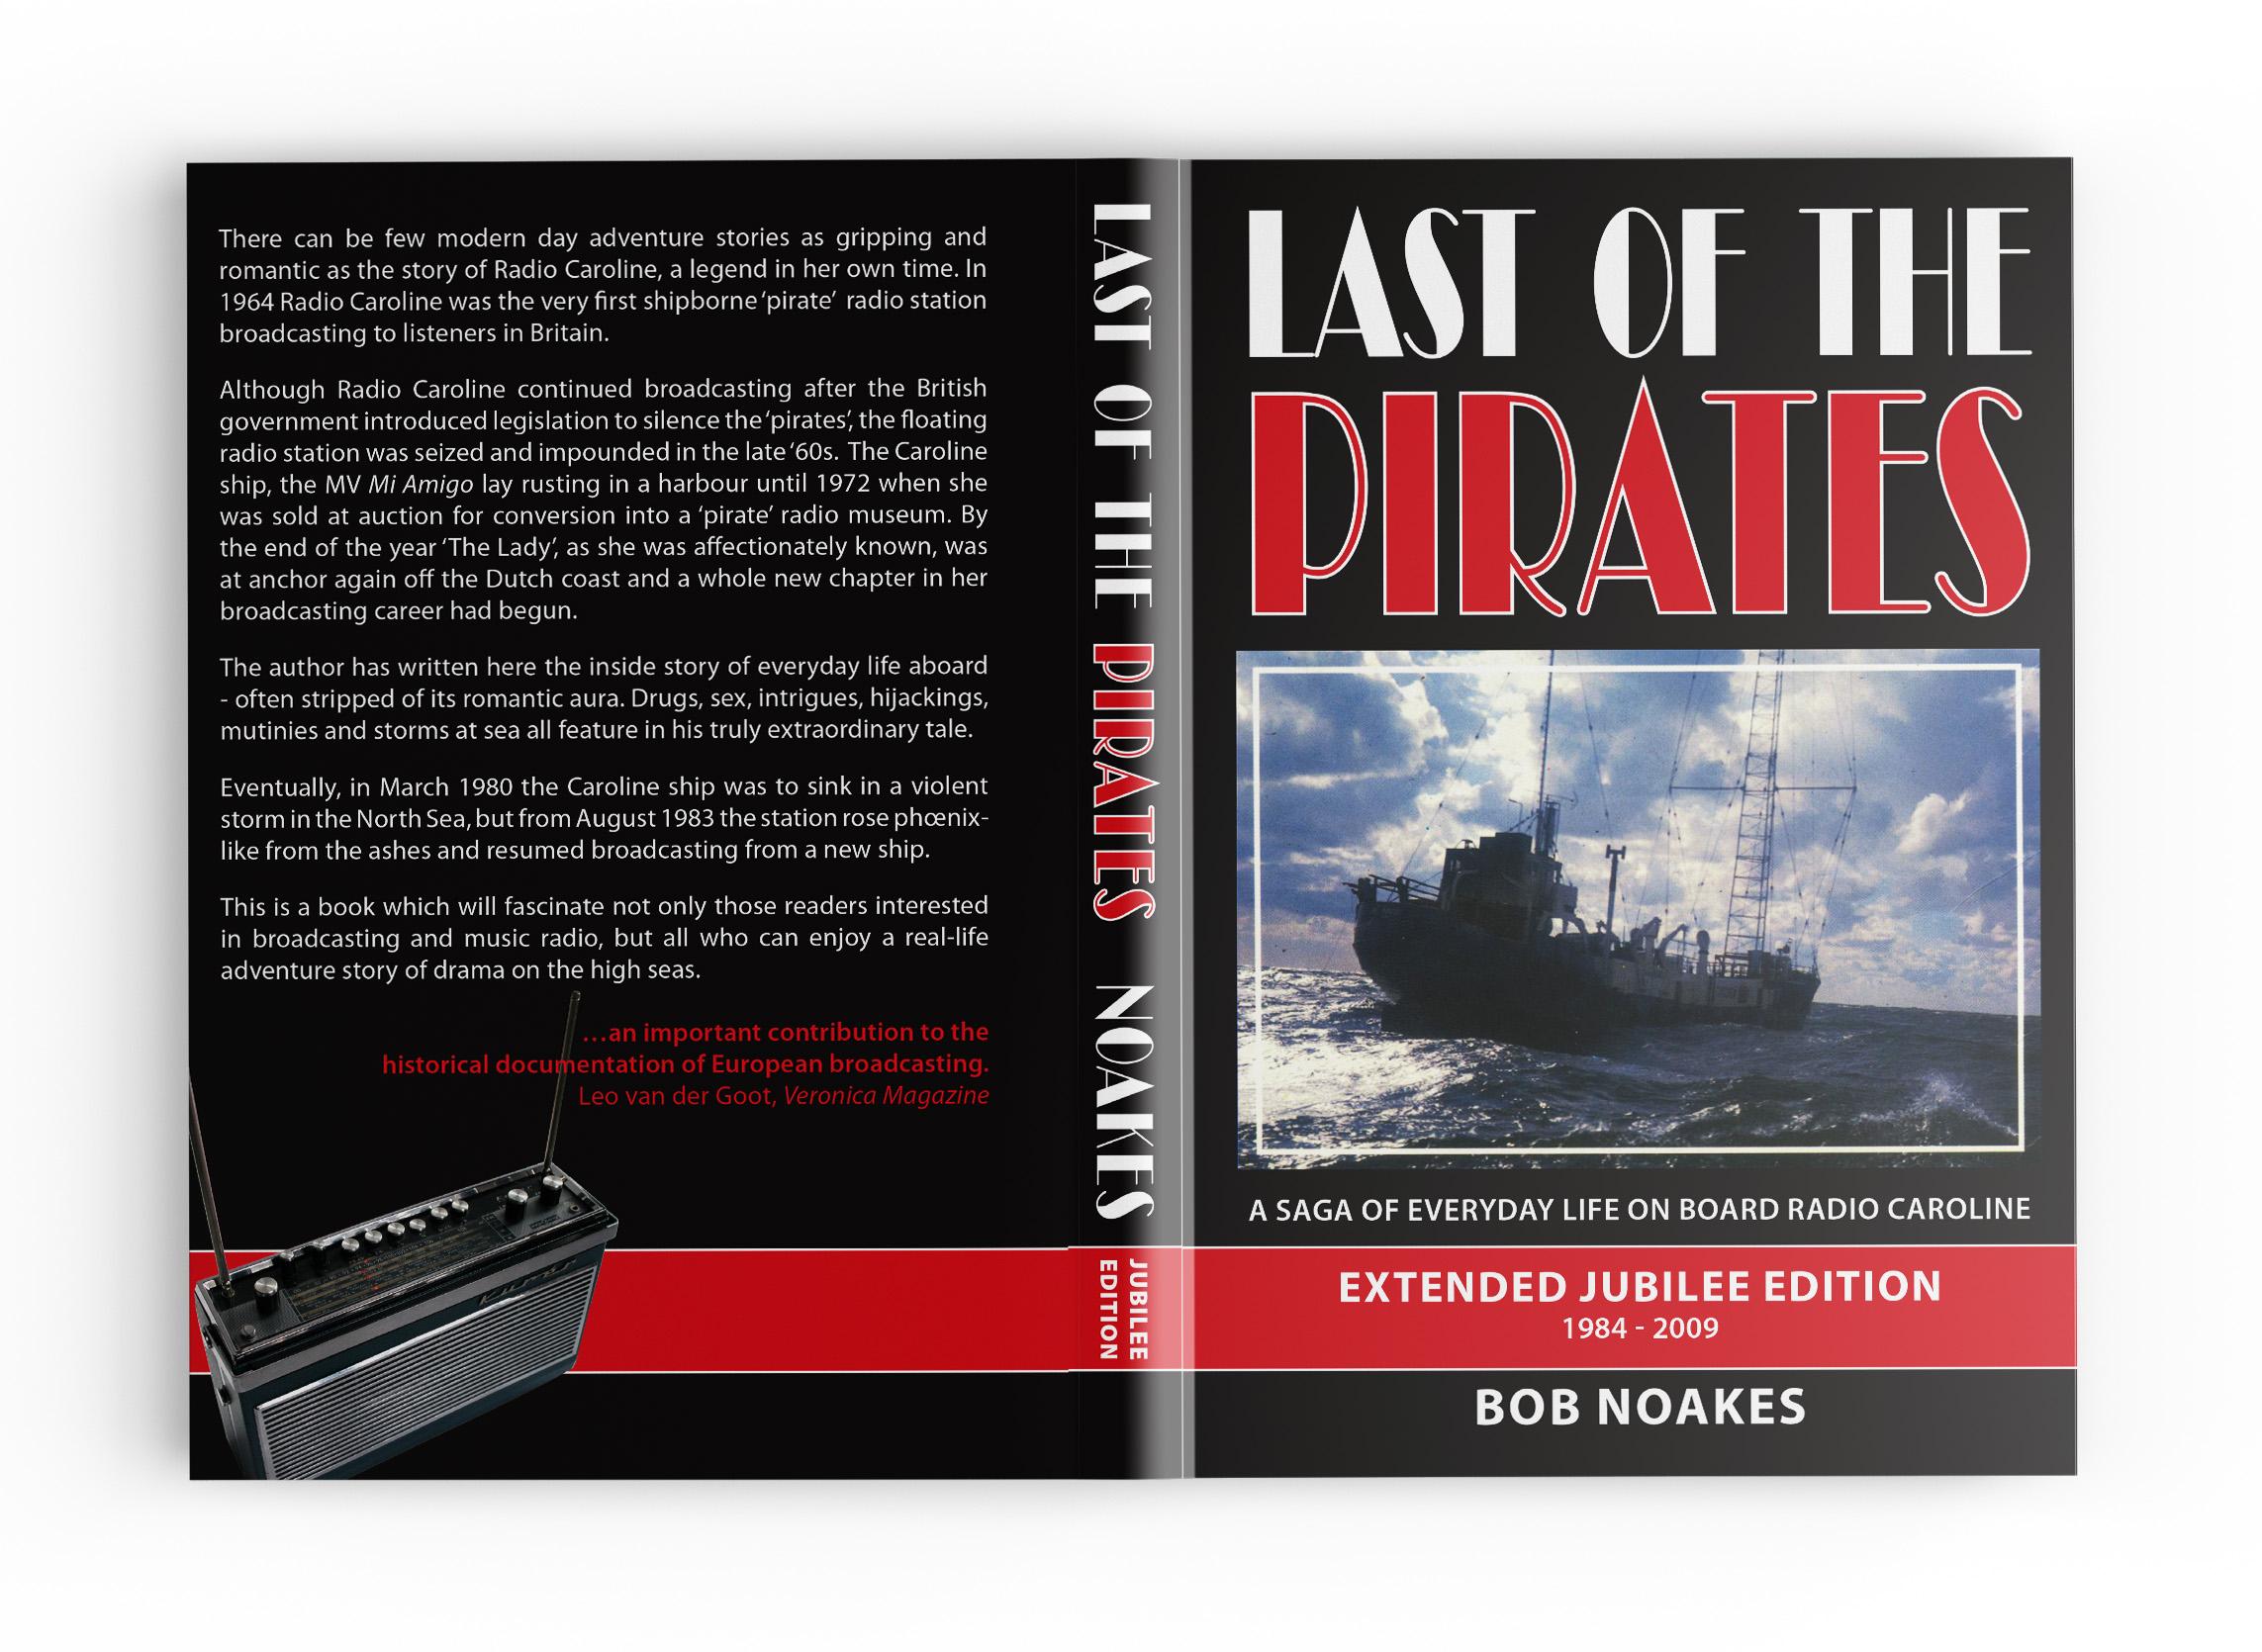 lastofthepirates-book-full-cover